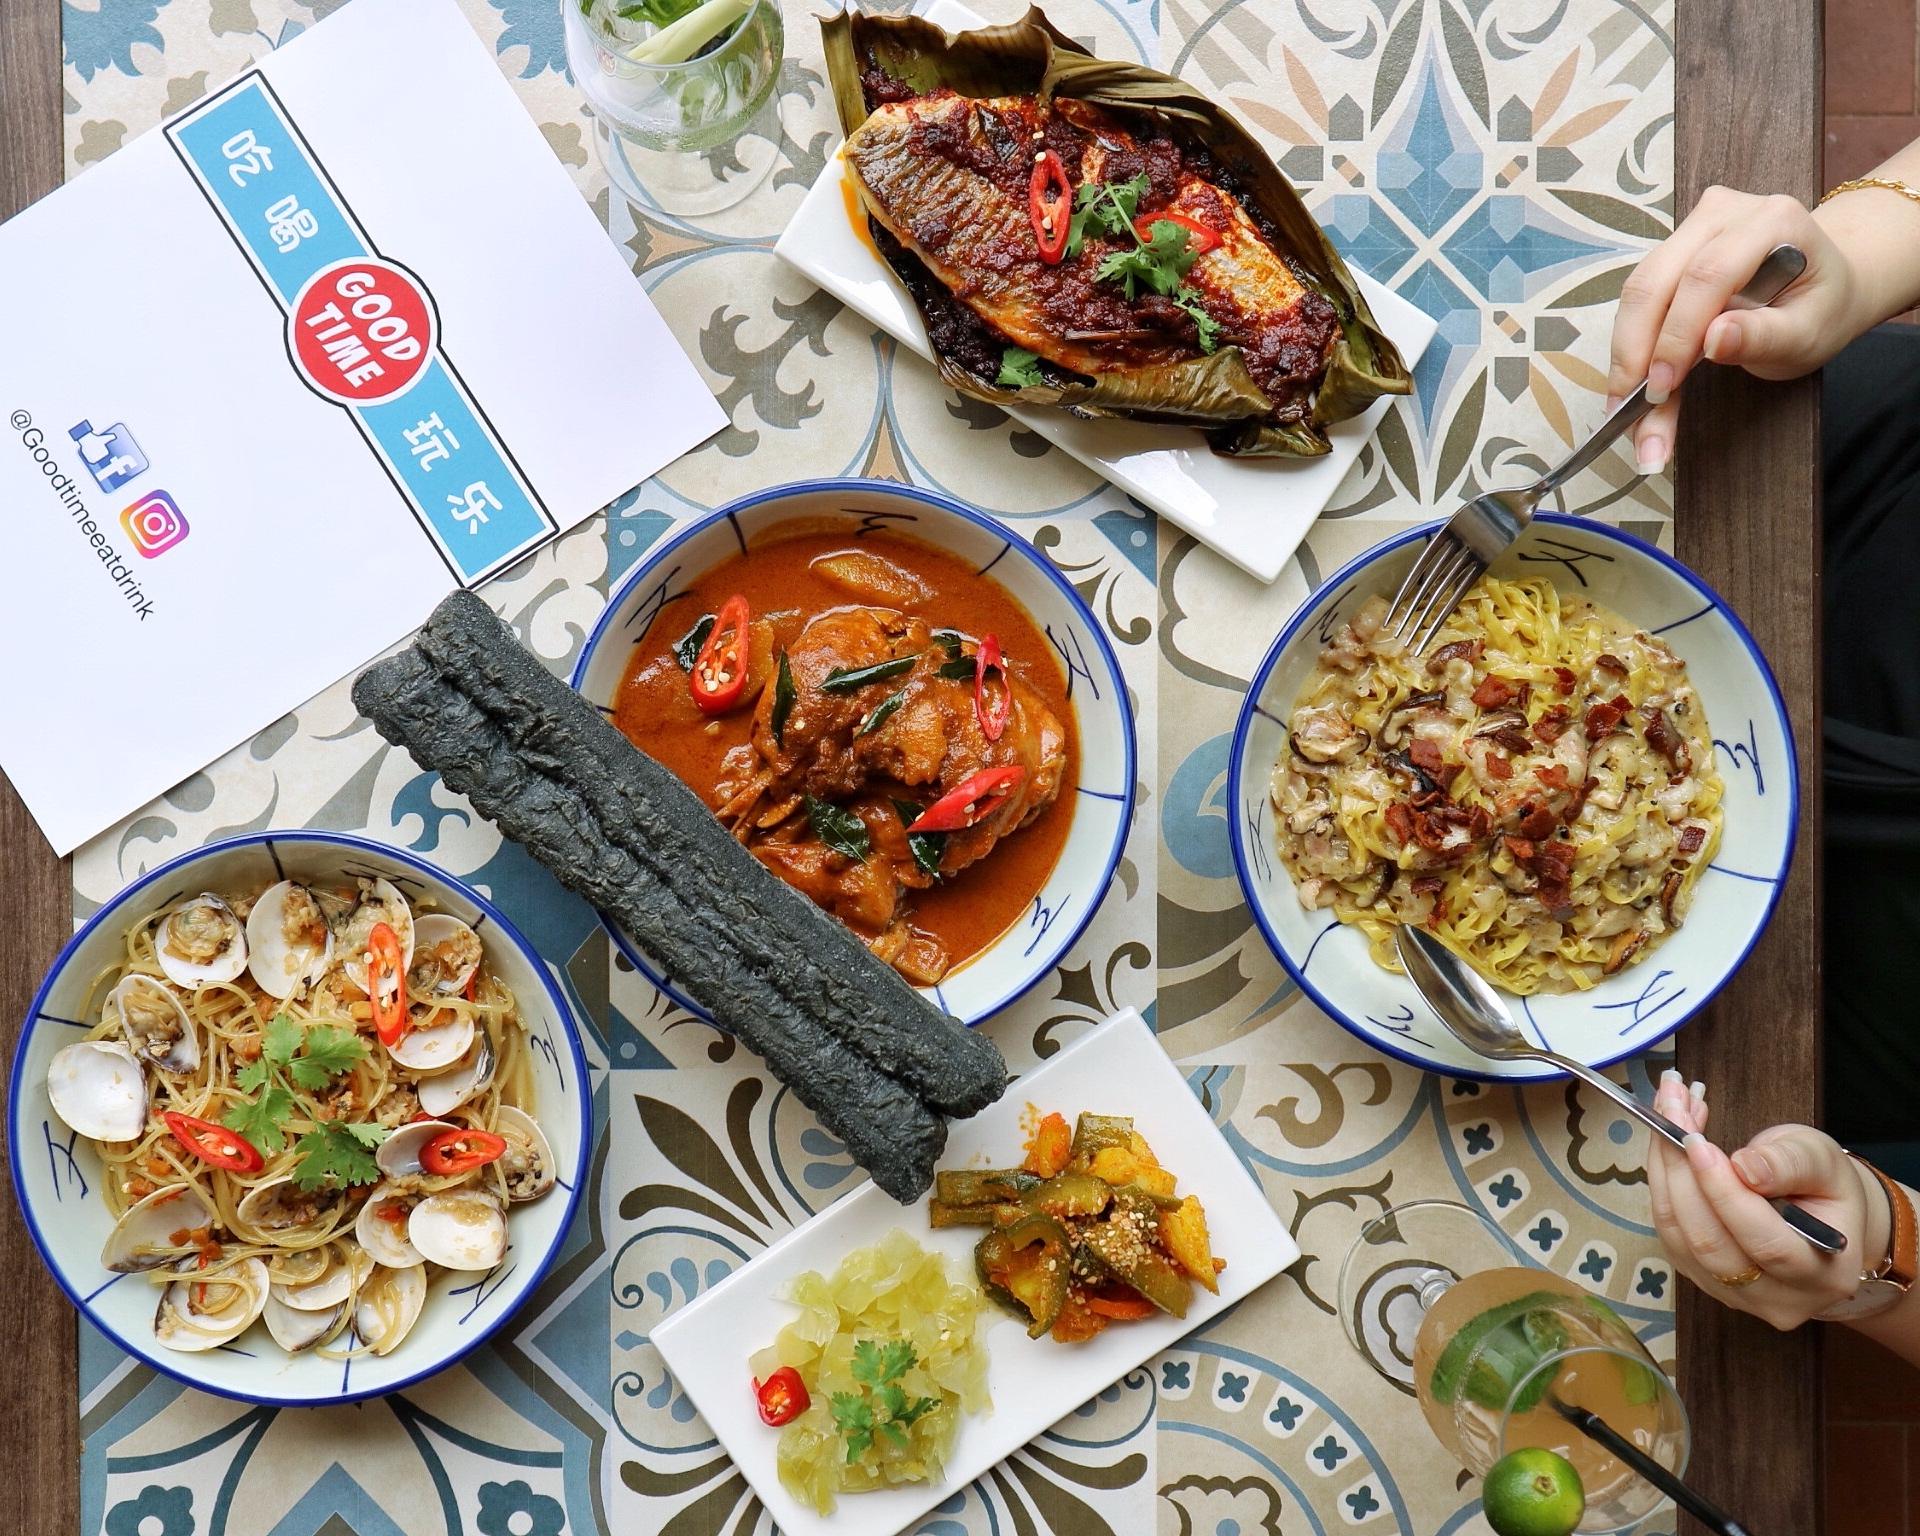 (NEW) Good Time Eat Drink: Popular Asian Favourites BUT with a Modern Twist – Hidden Gem in Siglap!